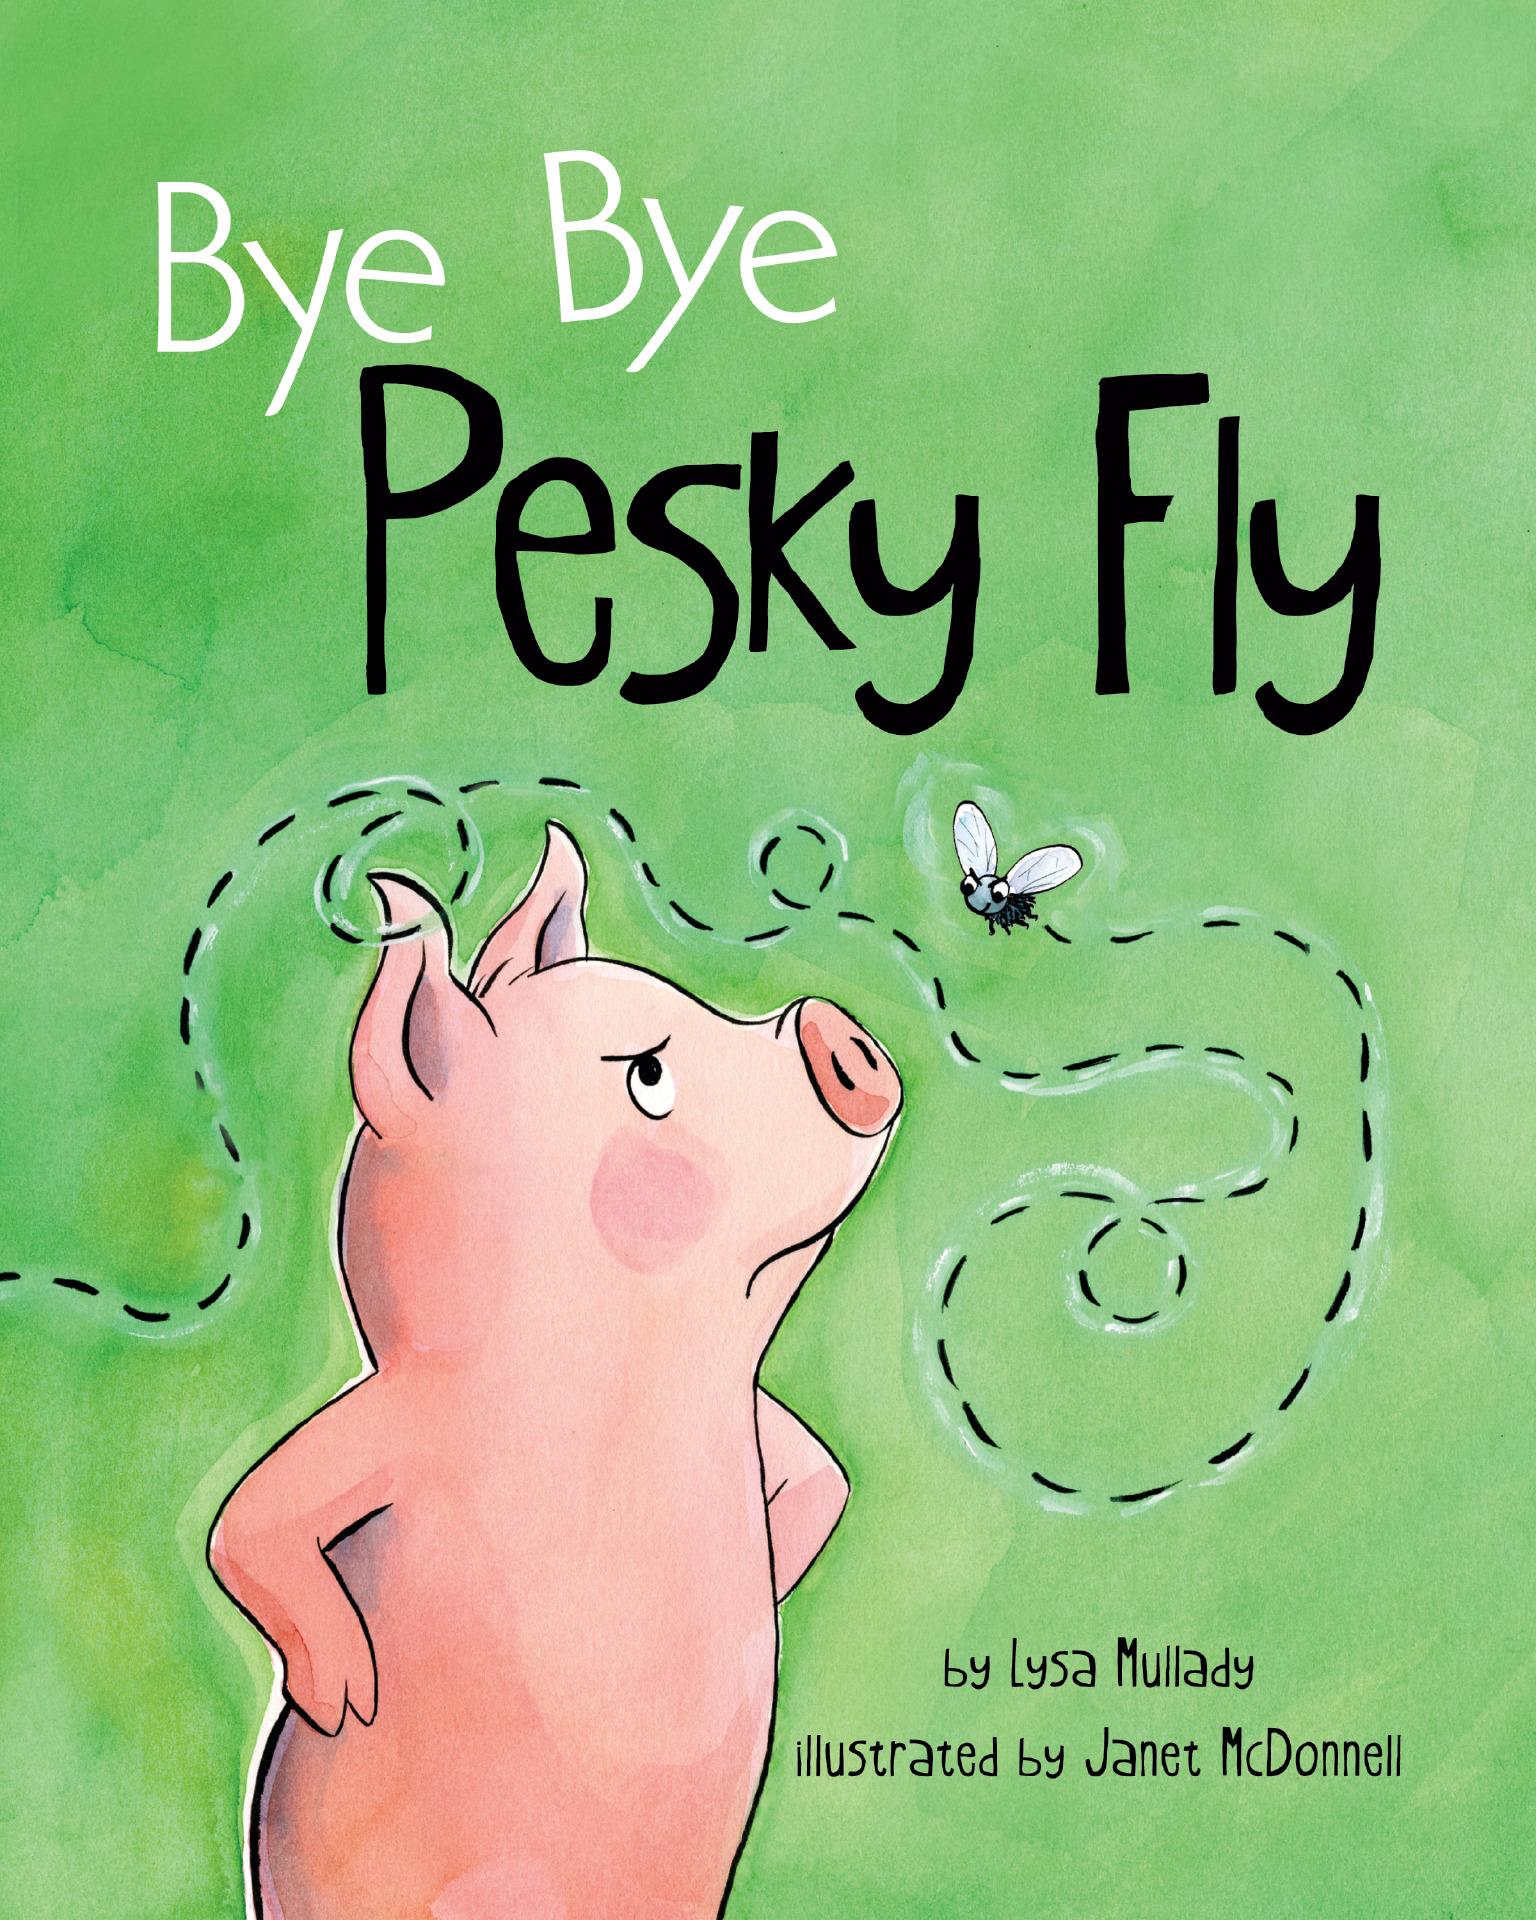 Bye Bye Pesky Fly By Lysa Mullady 05-01-18